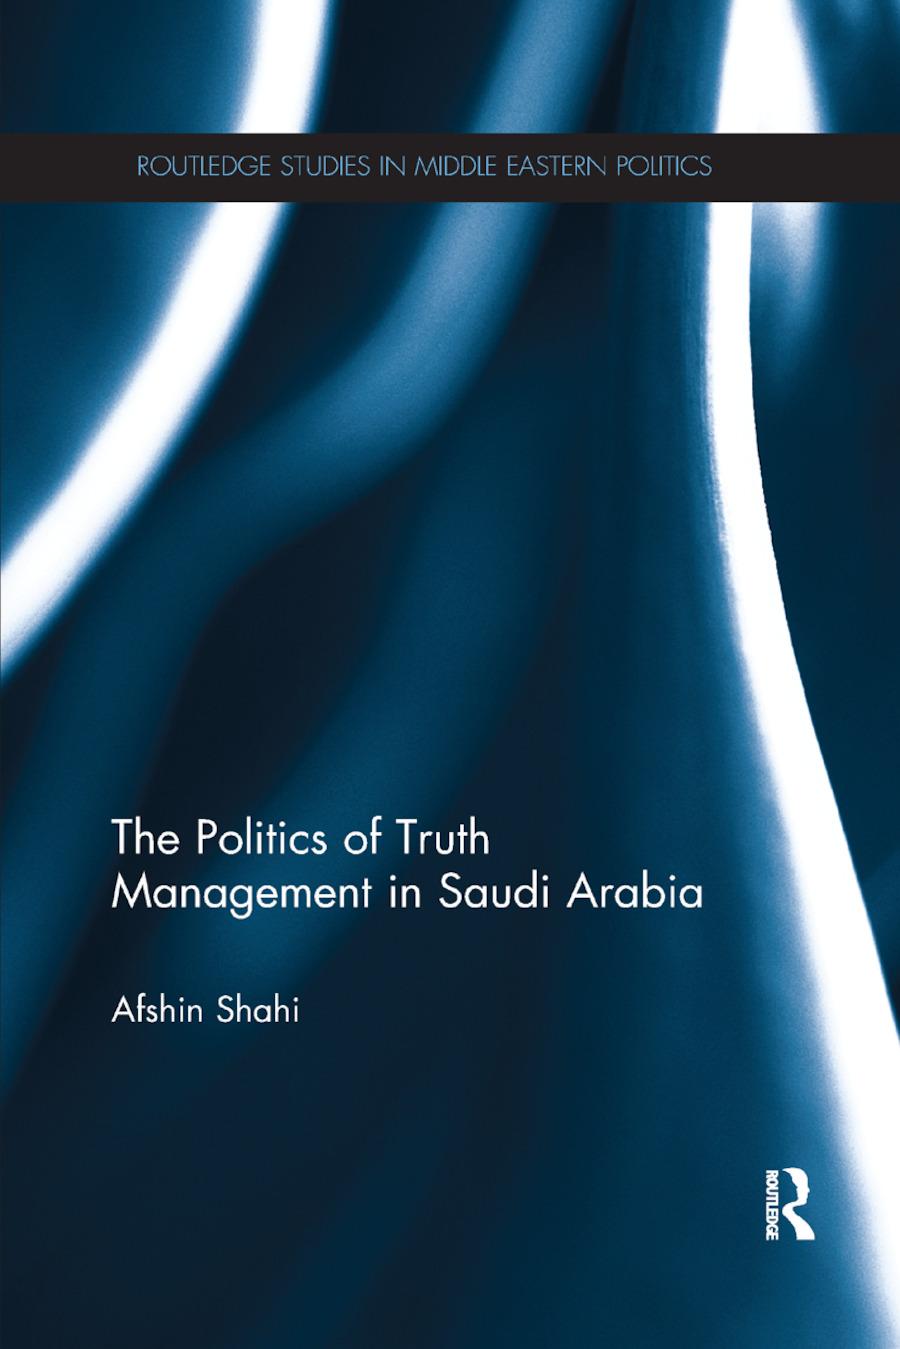 The Politics of Truth Management in Saudi Arabia book cover